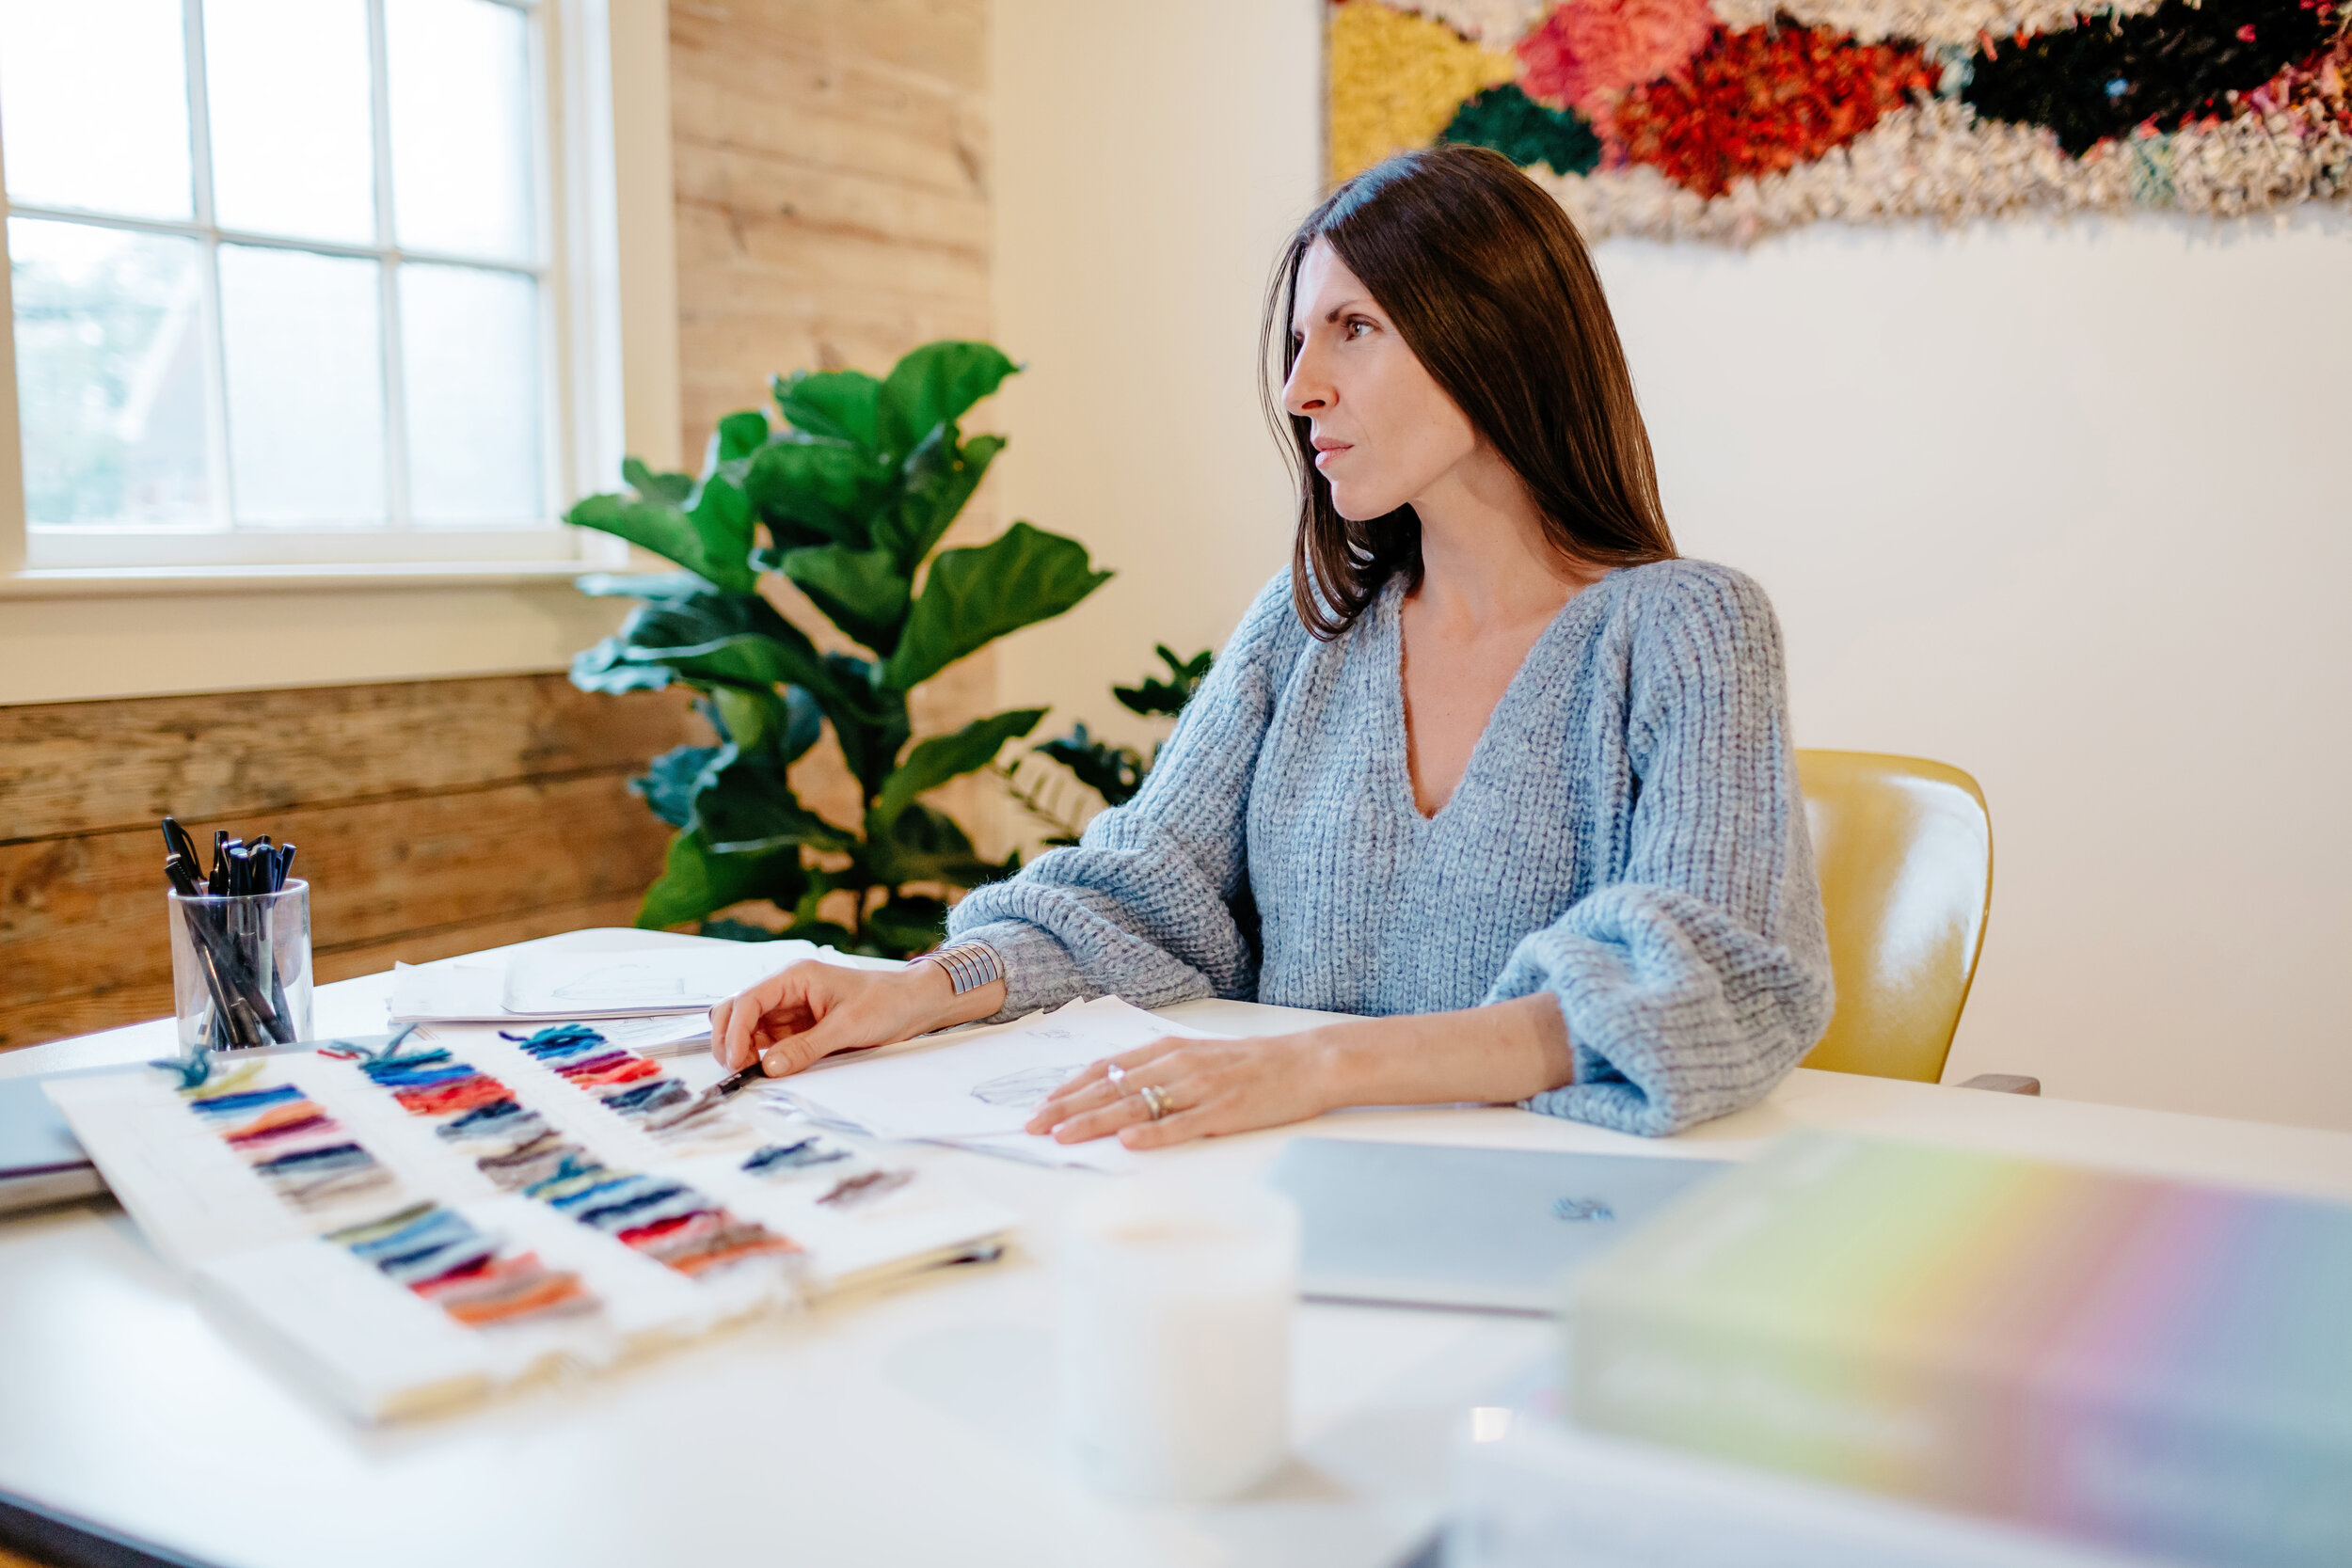 Co-founder: Catherine Carnevale at the ELEVEN SIX design studio in Kingston, NY